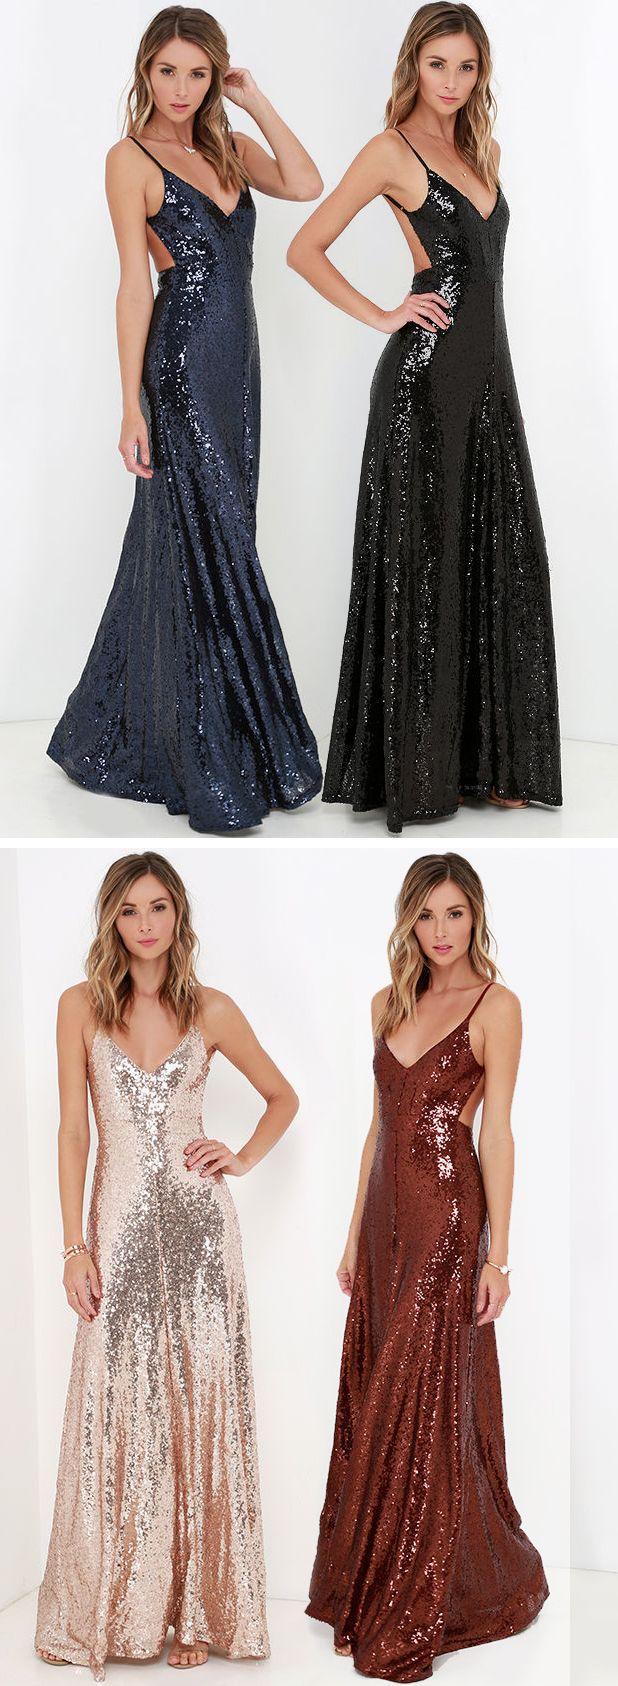 best prom images on pinterest long prom dresses prom dresses